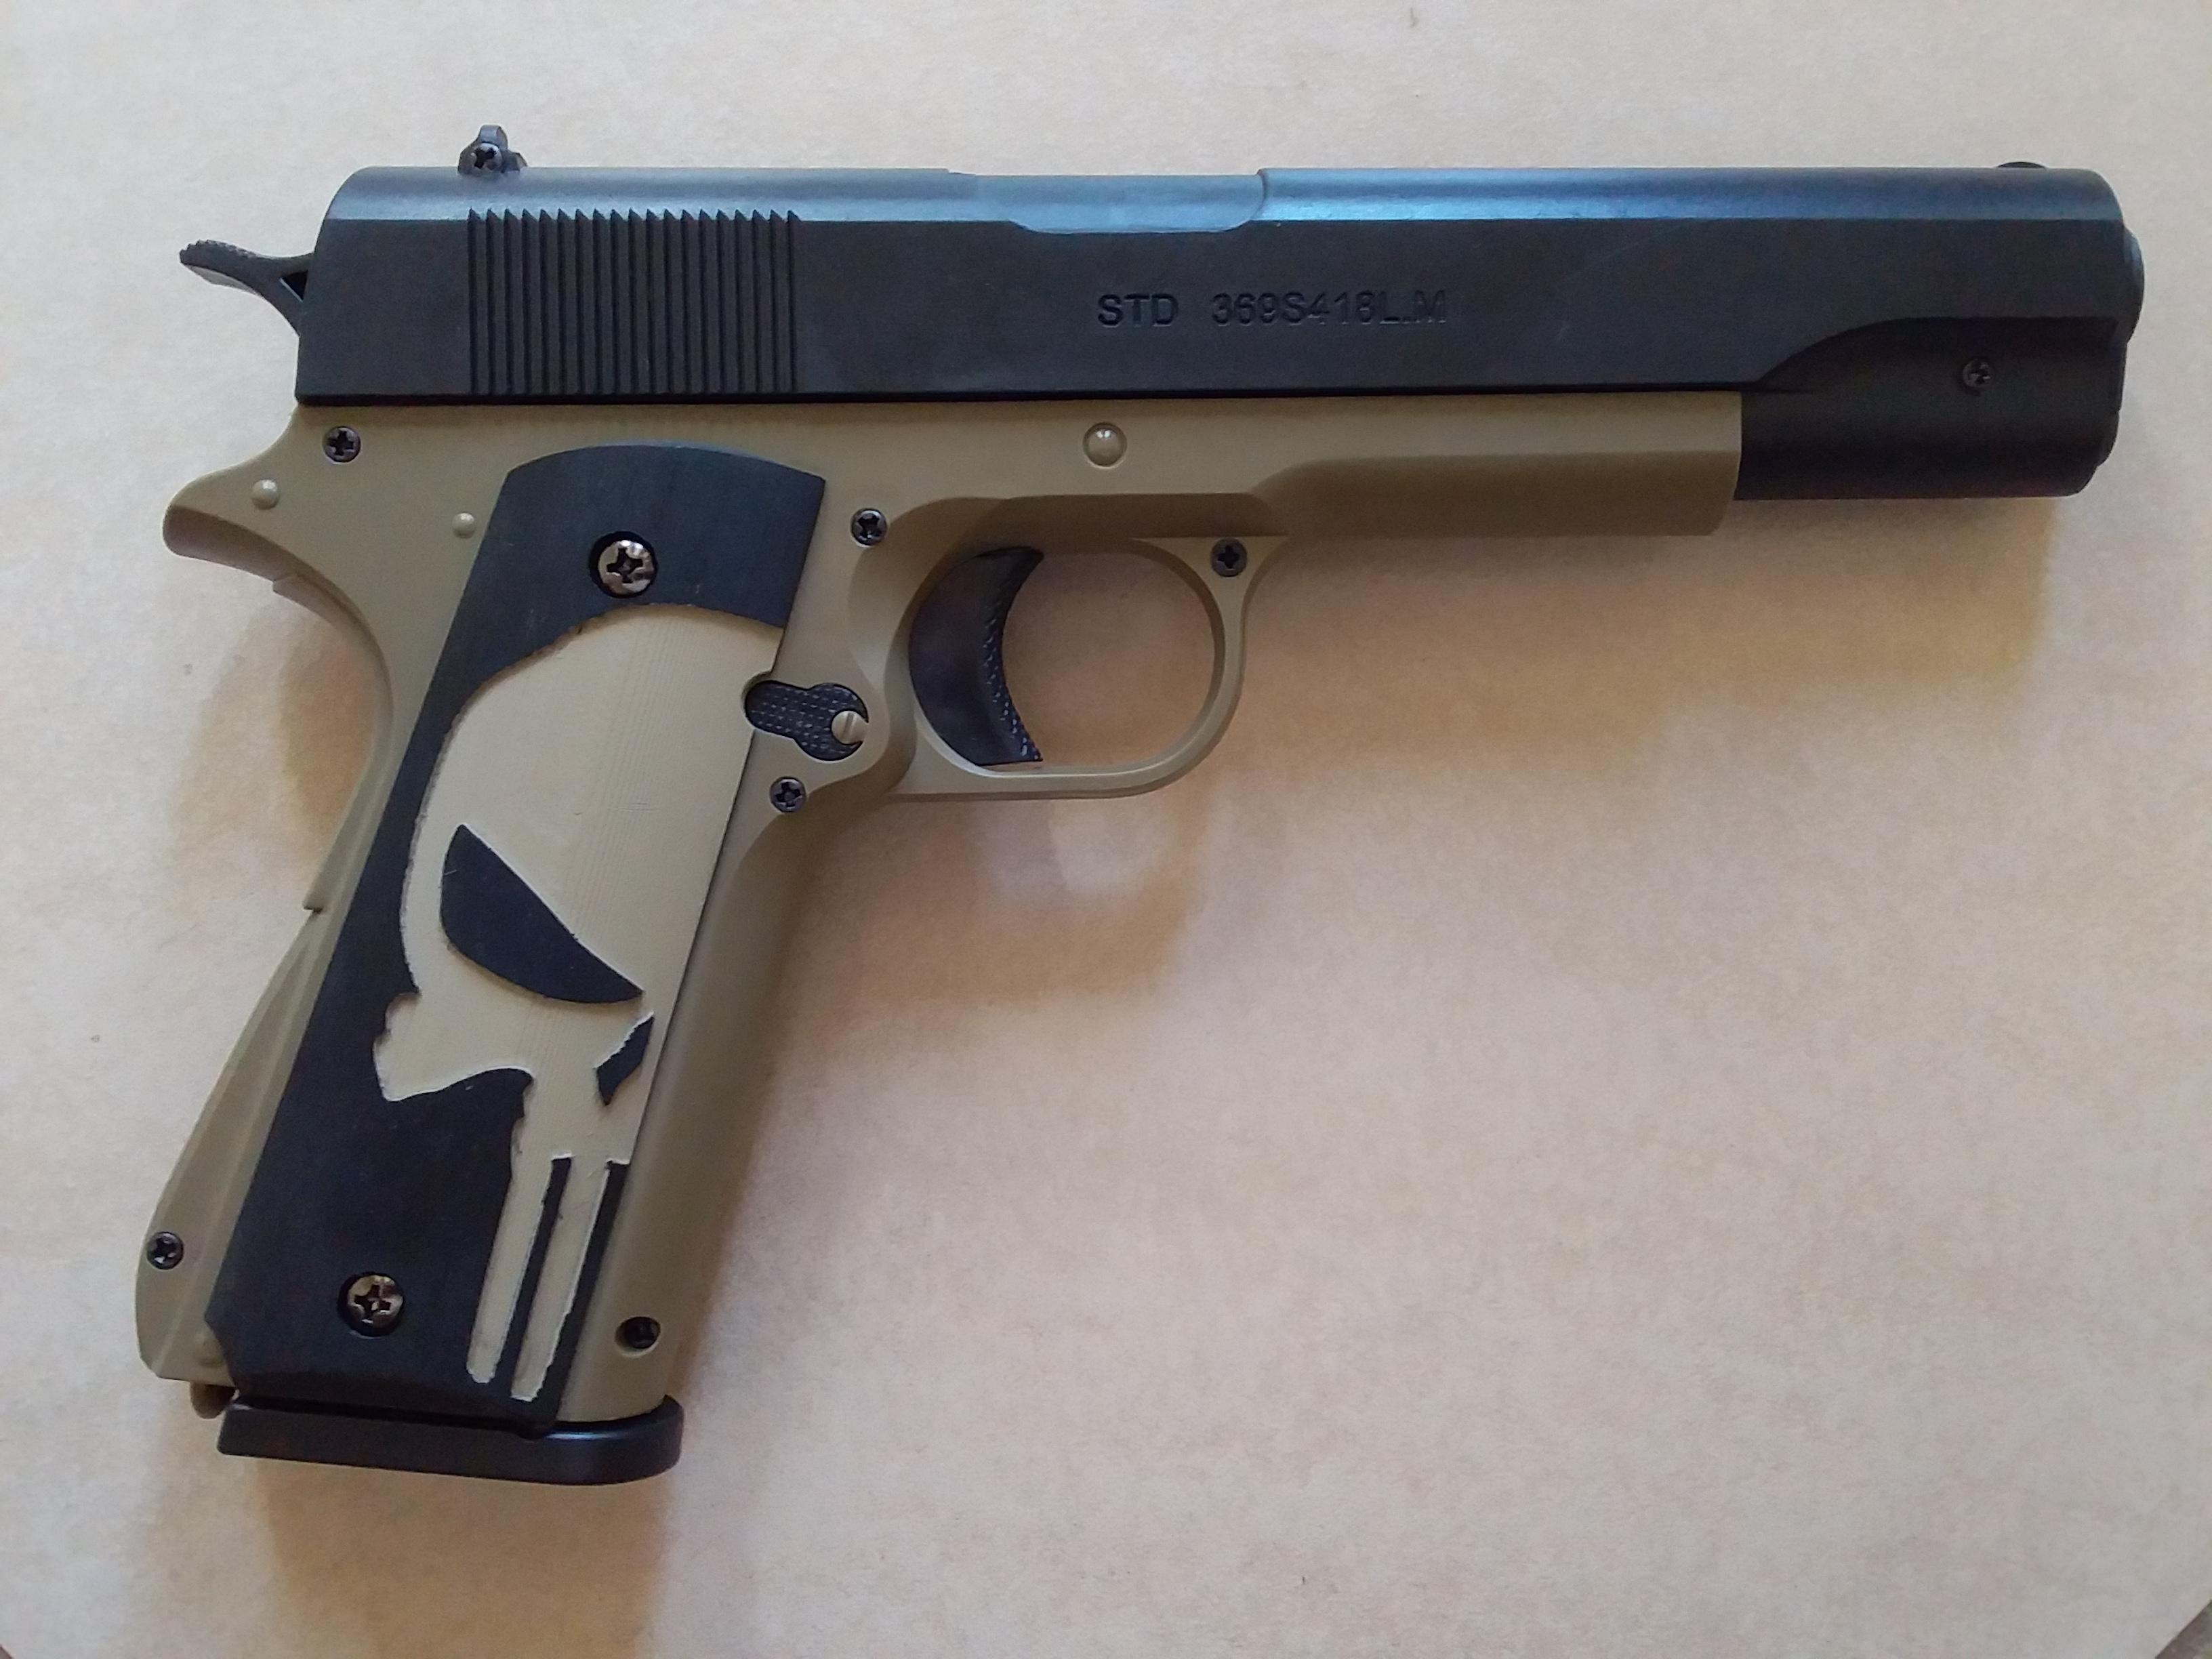 STD 1911 Manual Gel Blaster Punisher Grips by Superpoo - Thingiverse